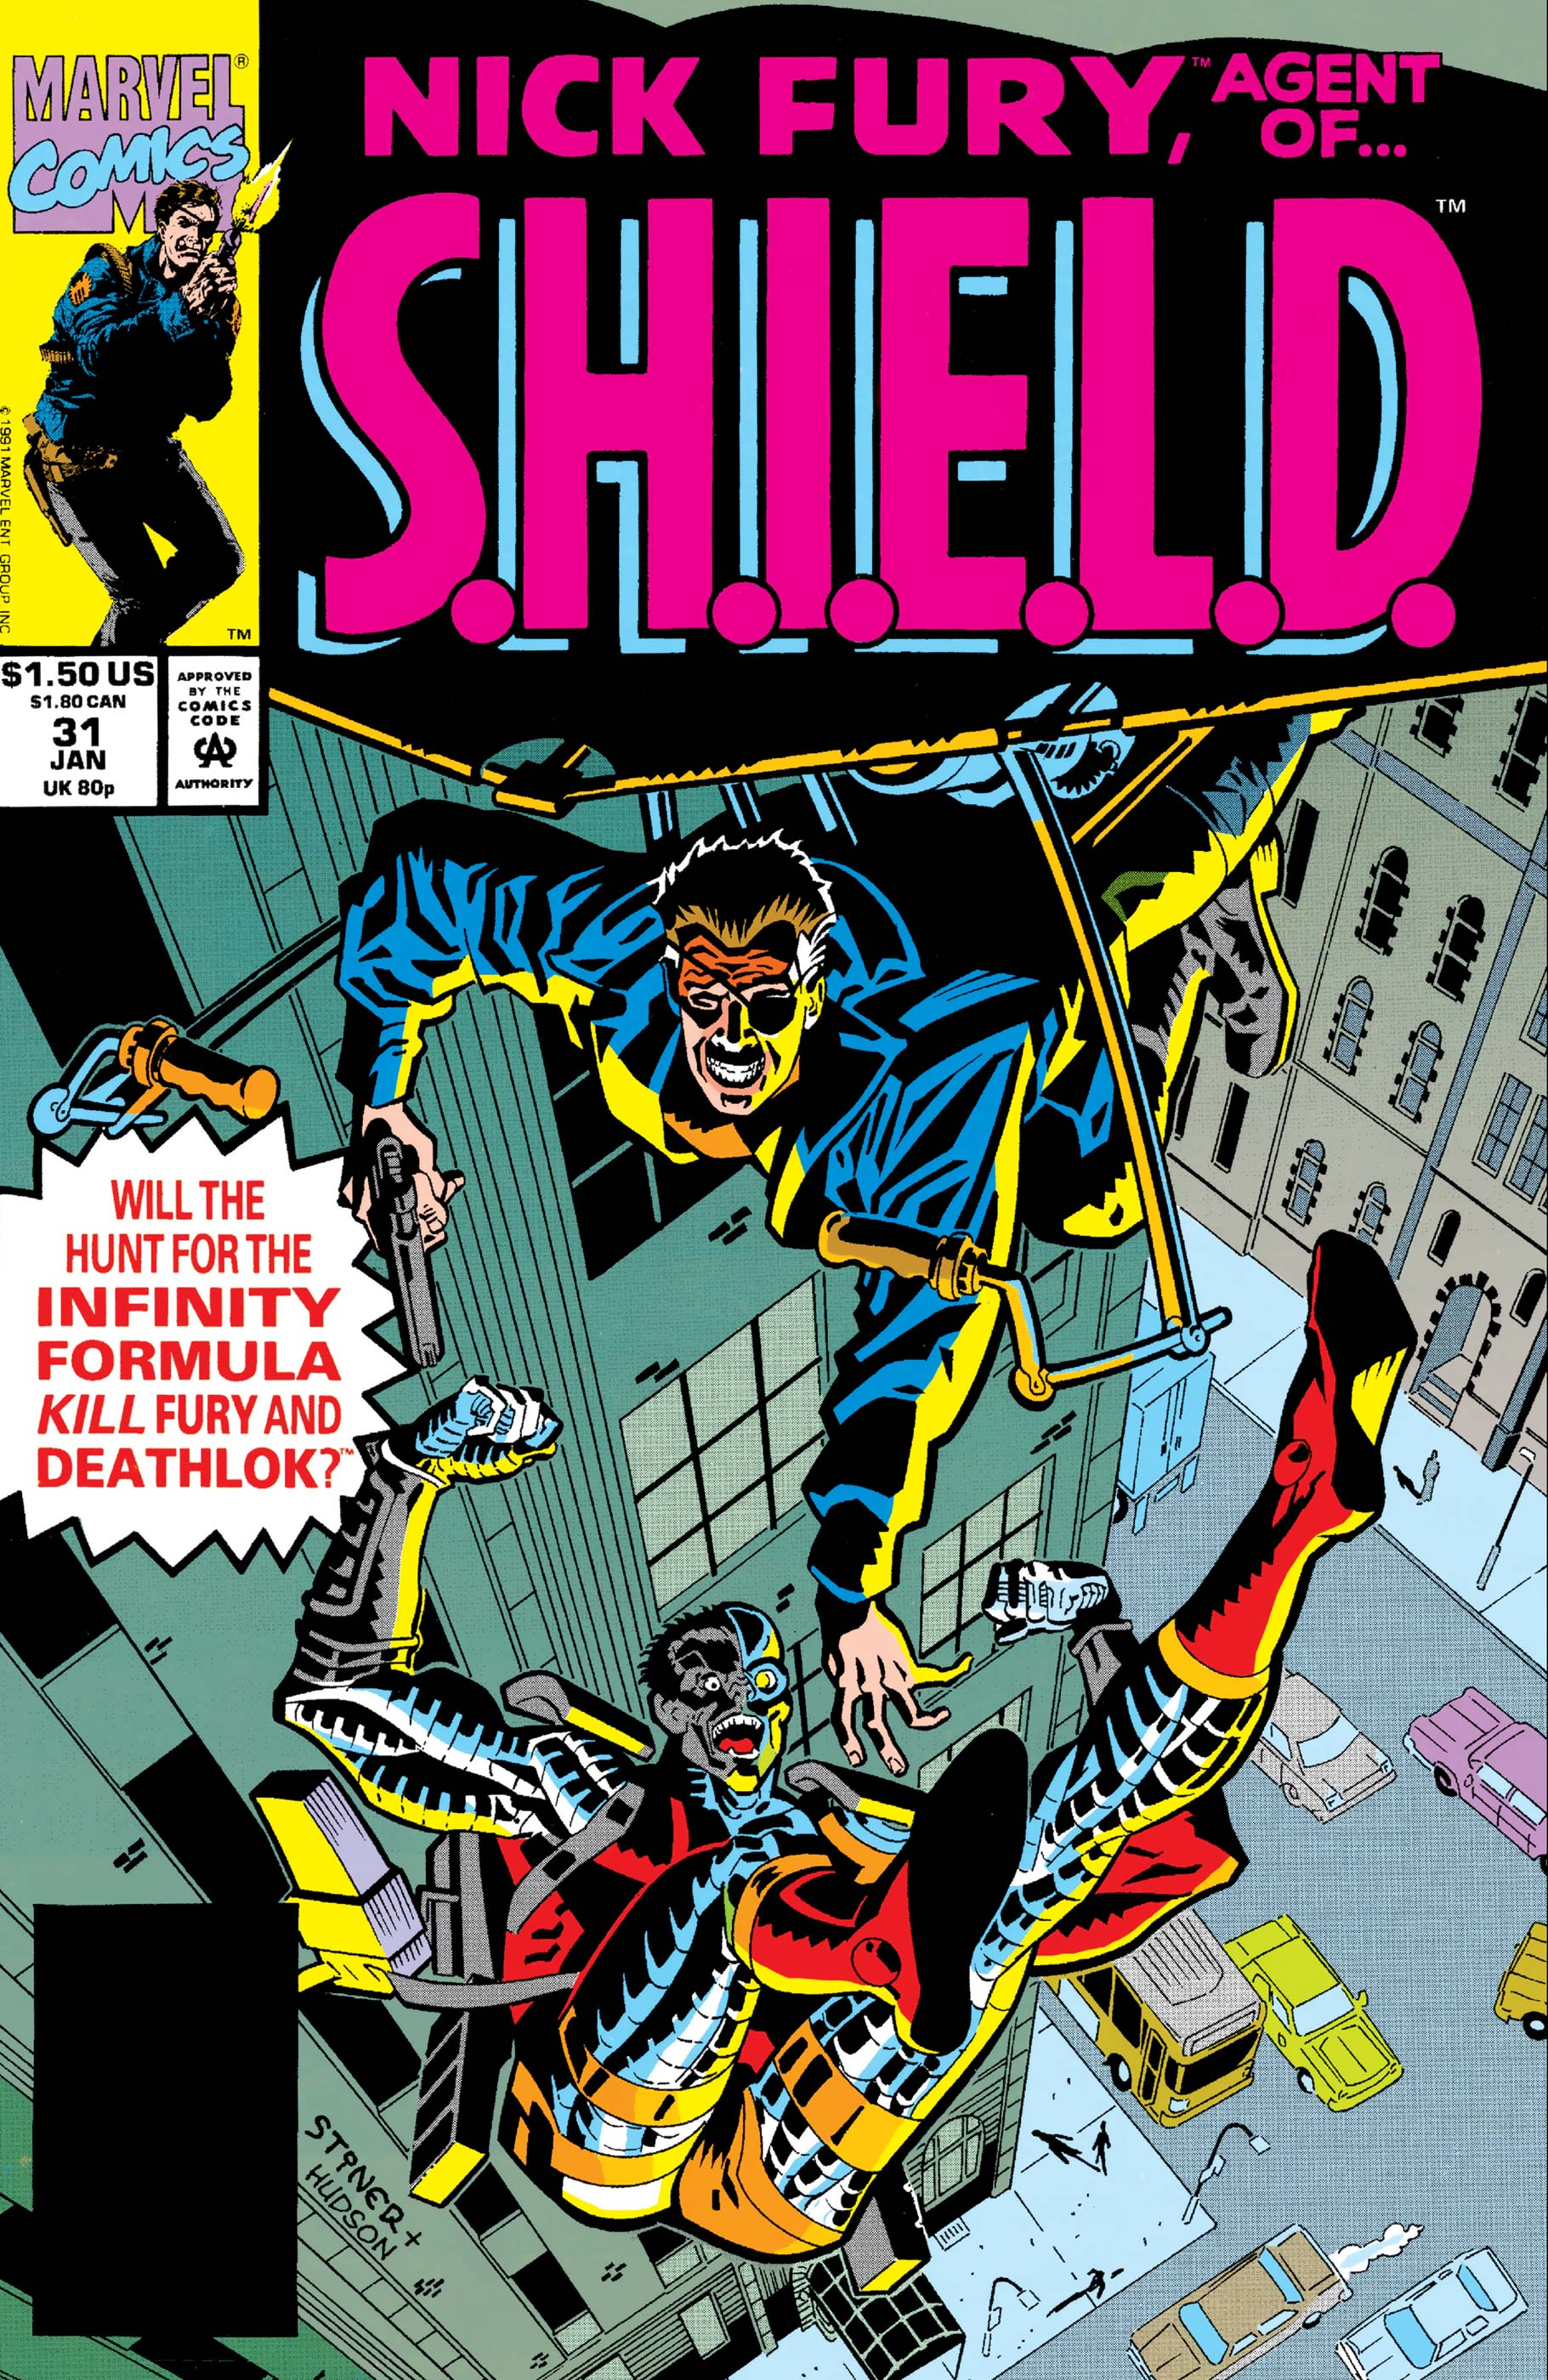 Nick Fury, Agent of S.H.I.E.L.D. (1989) #31